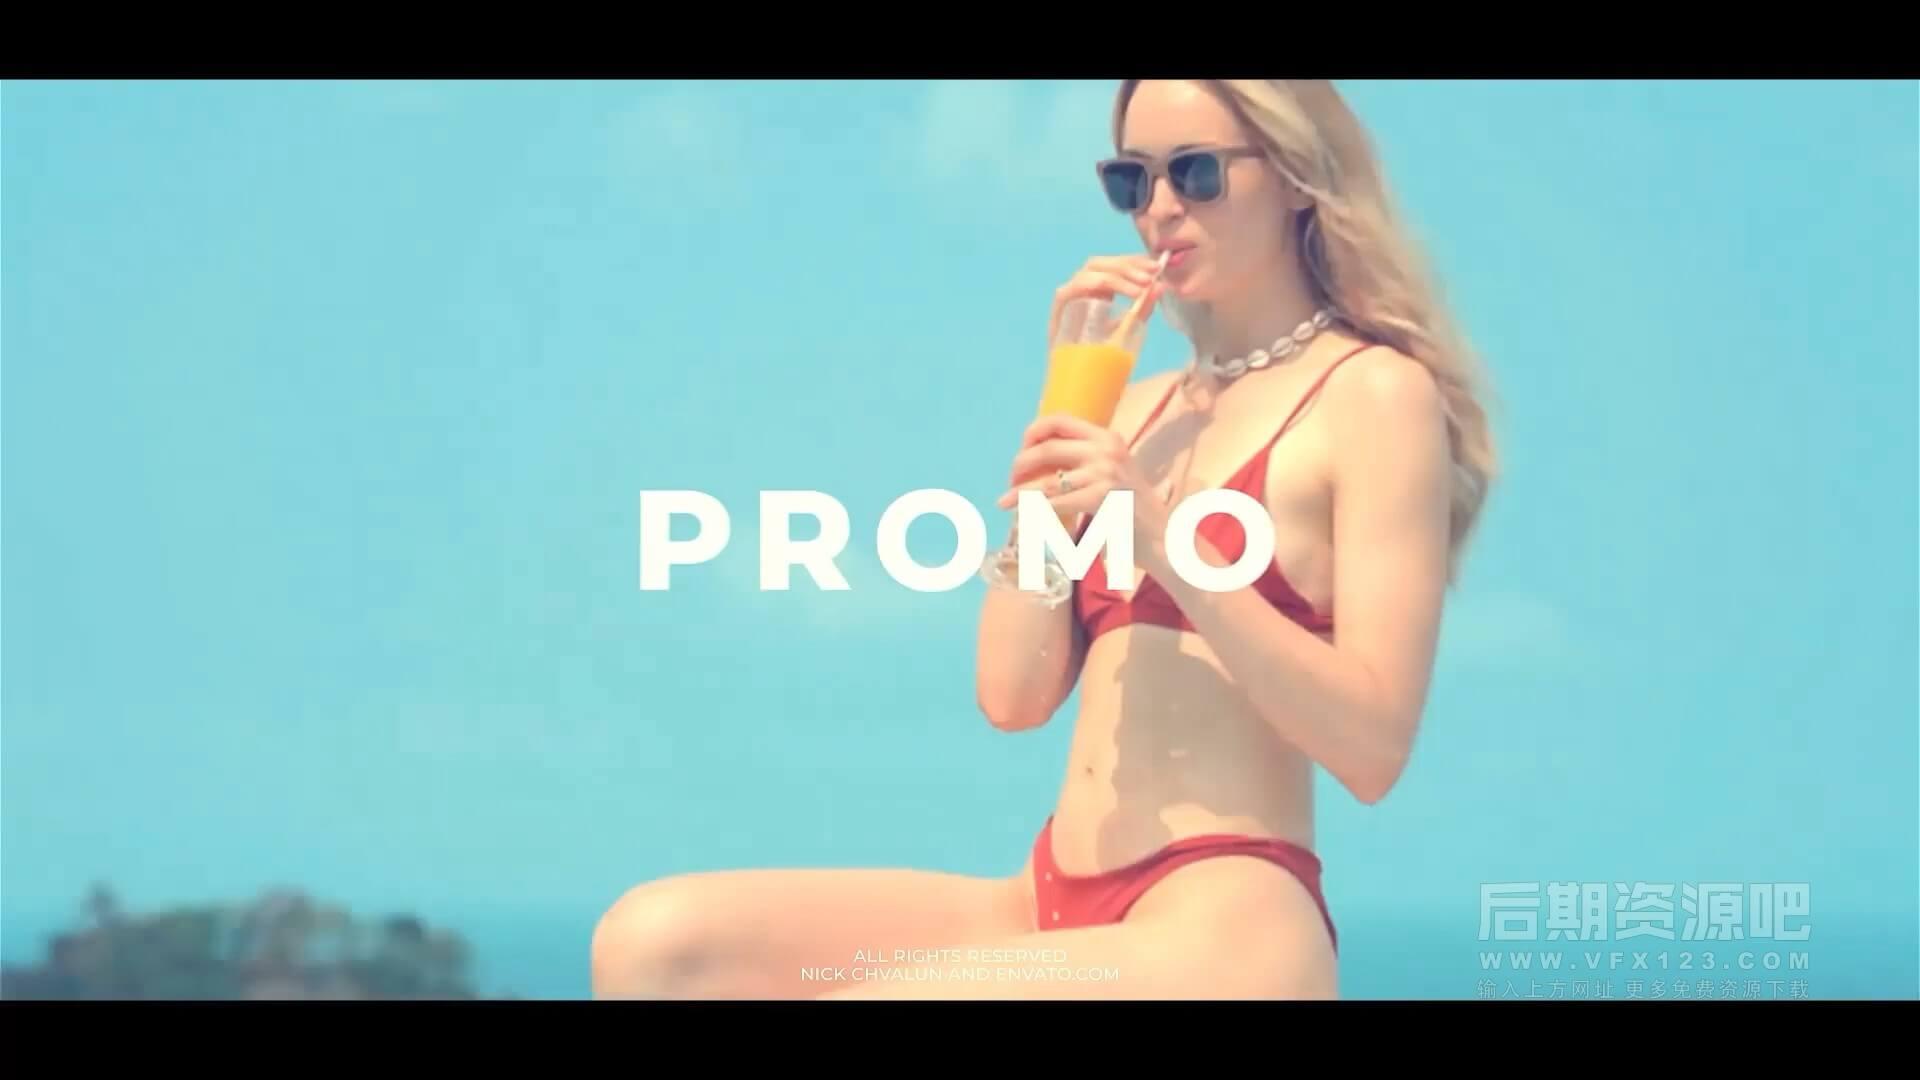 fcpx主题模板 时尚流行个性节奏感图文展示片头 Fashion Slideshow